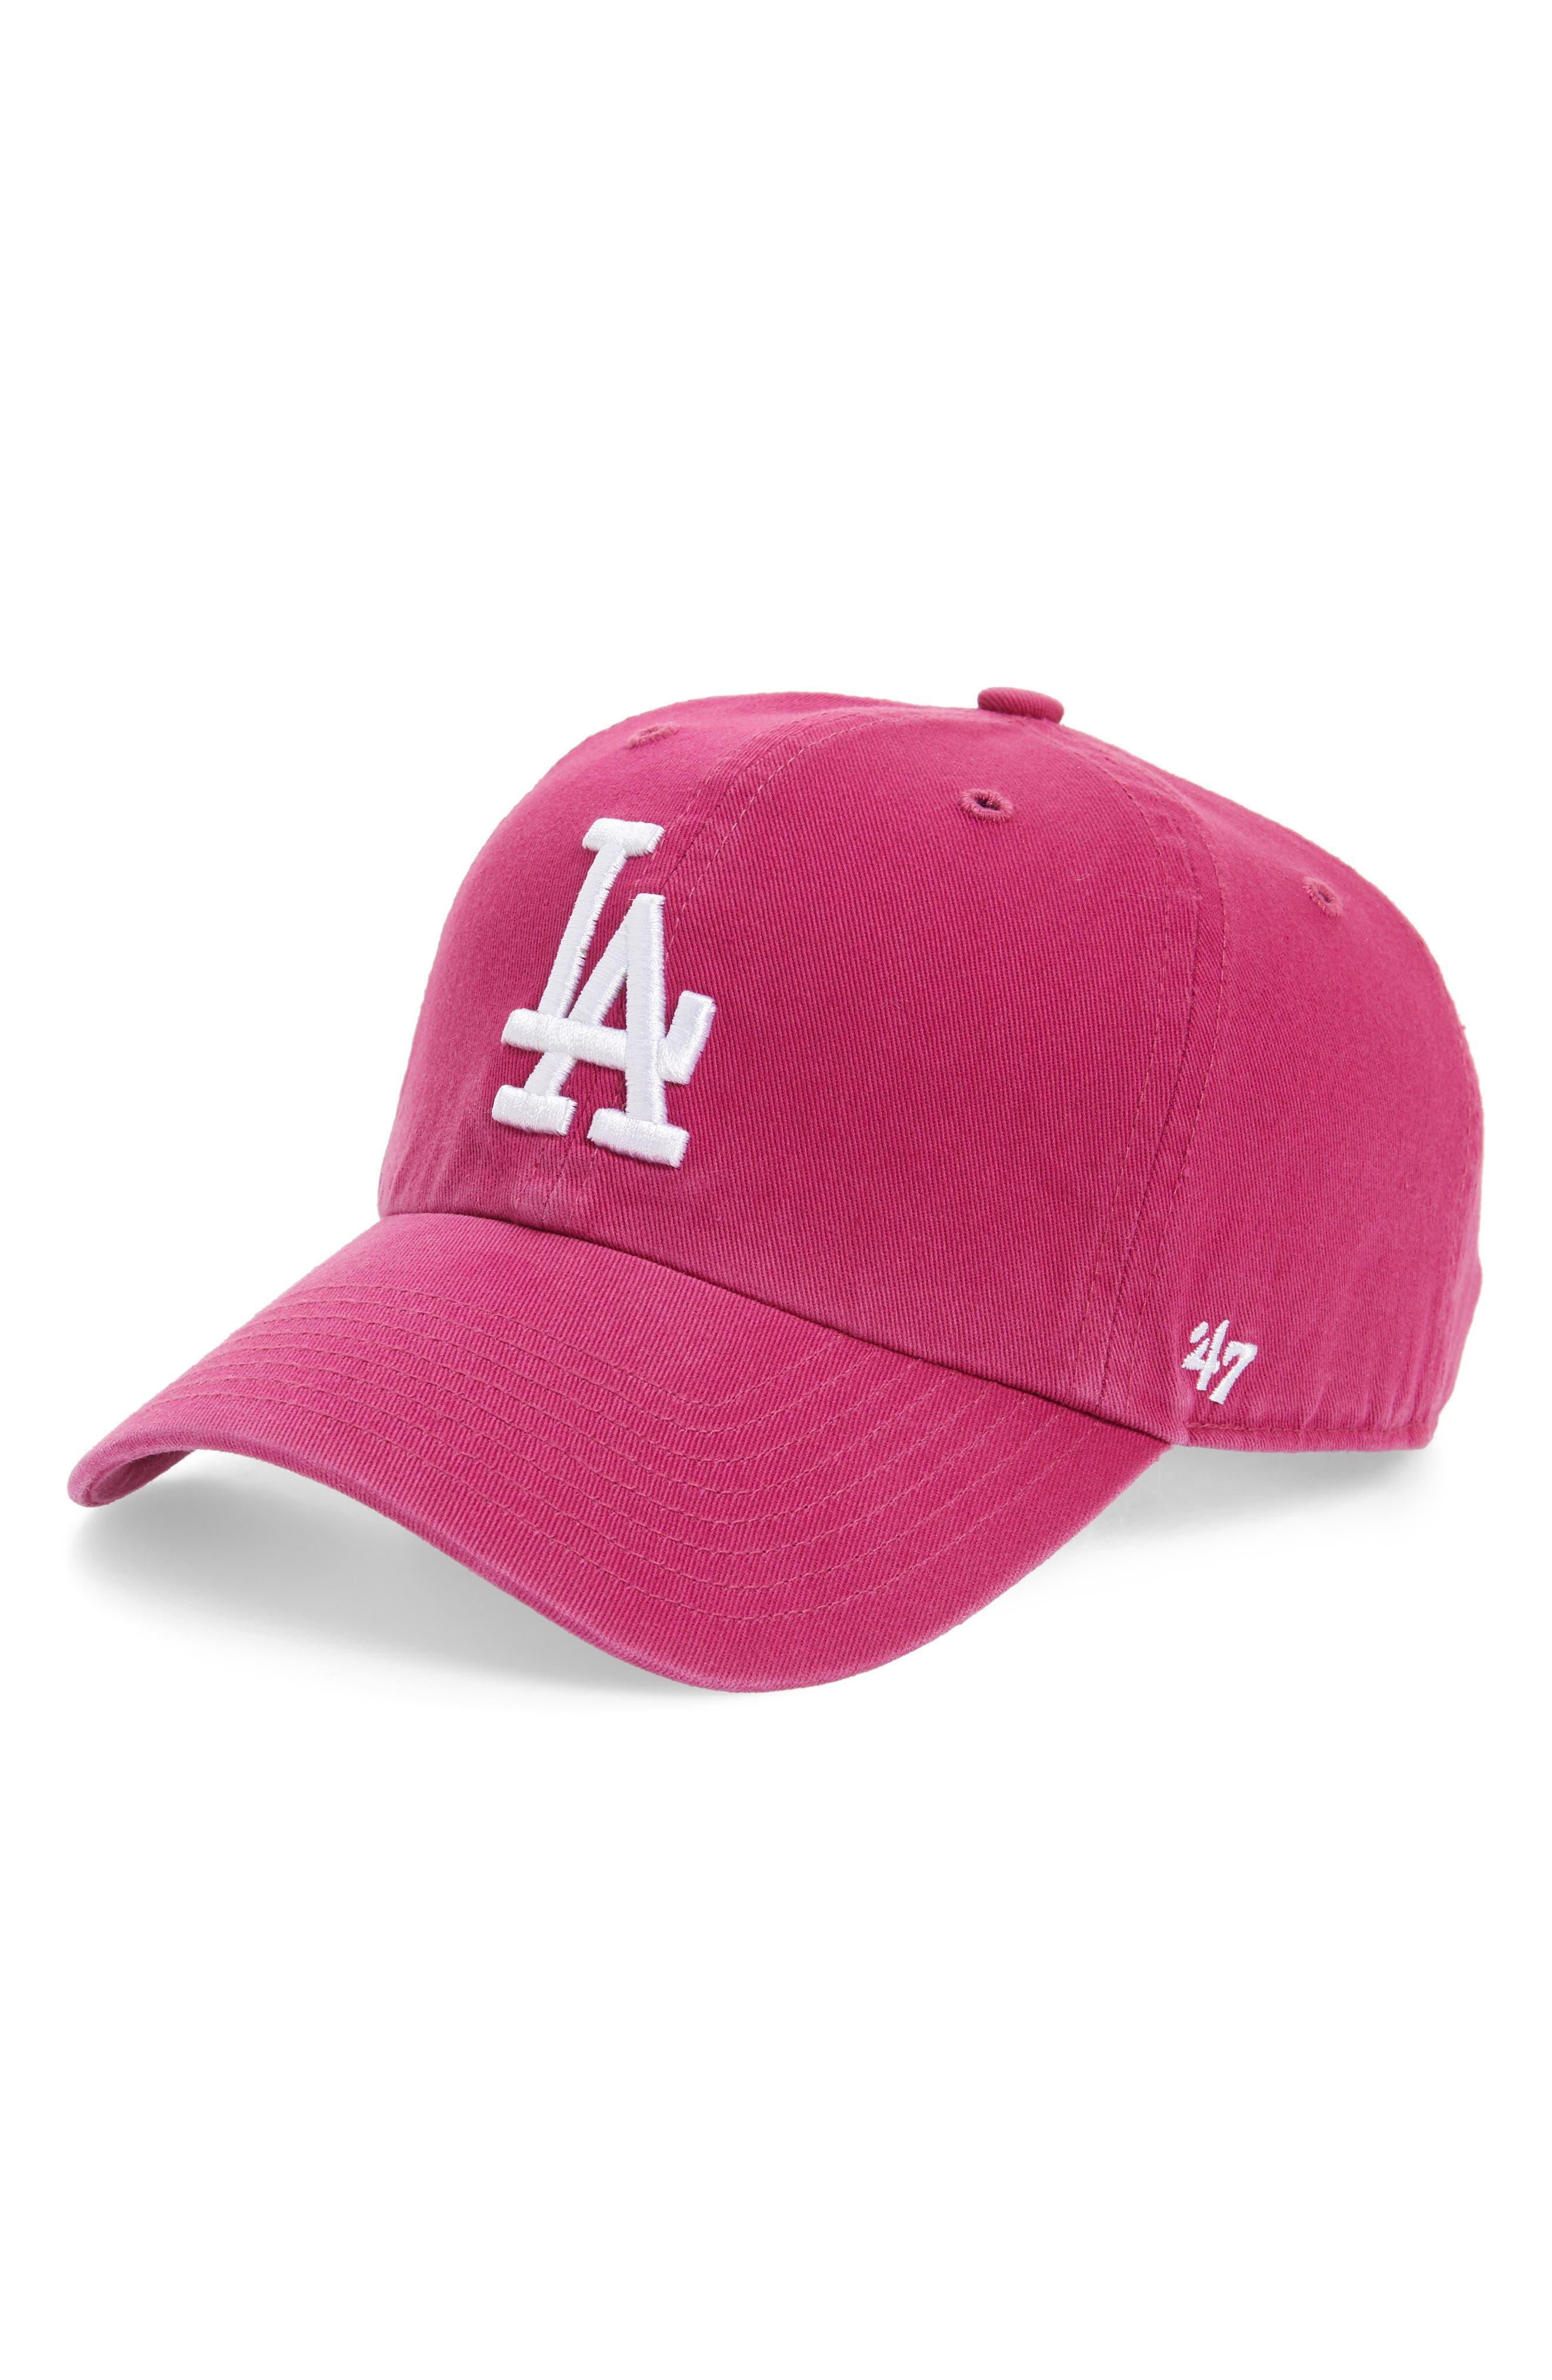 '47 Clean Up Los Angeles Dodgers Baseball Cap